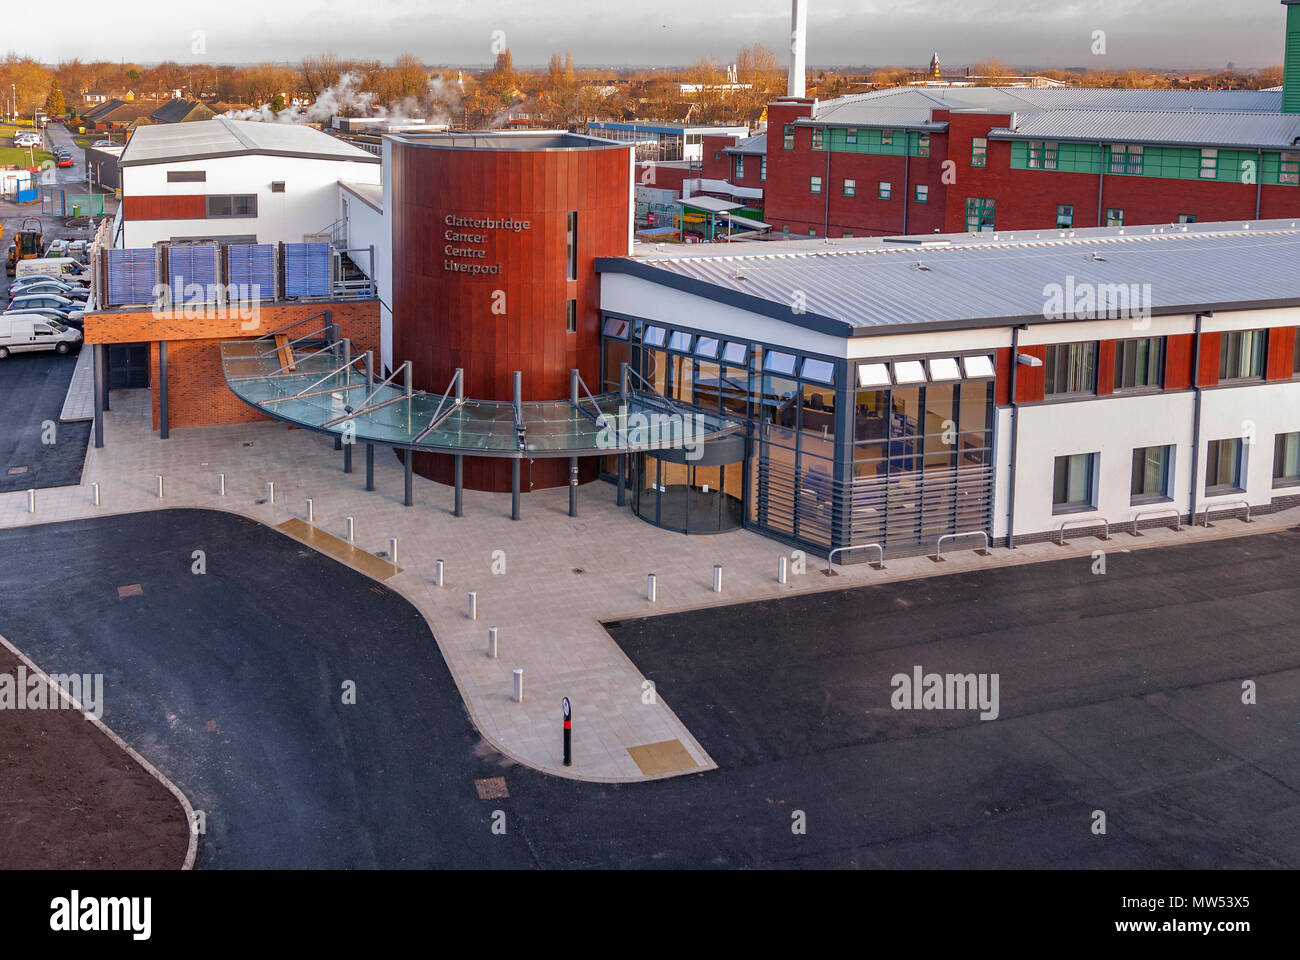 Clatterbridge Cancer Centre Liverpool. - Stock Image